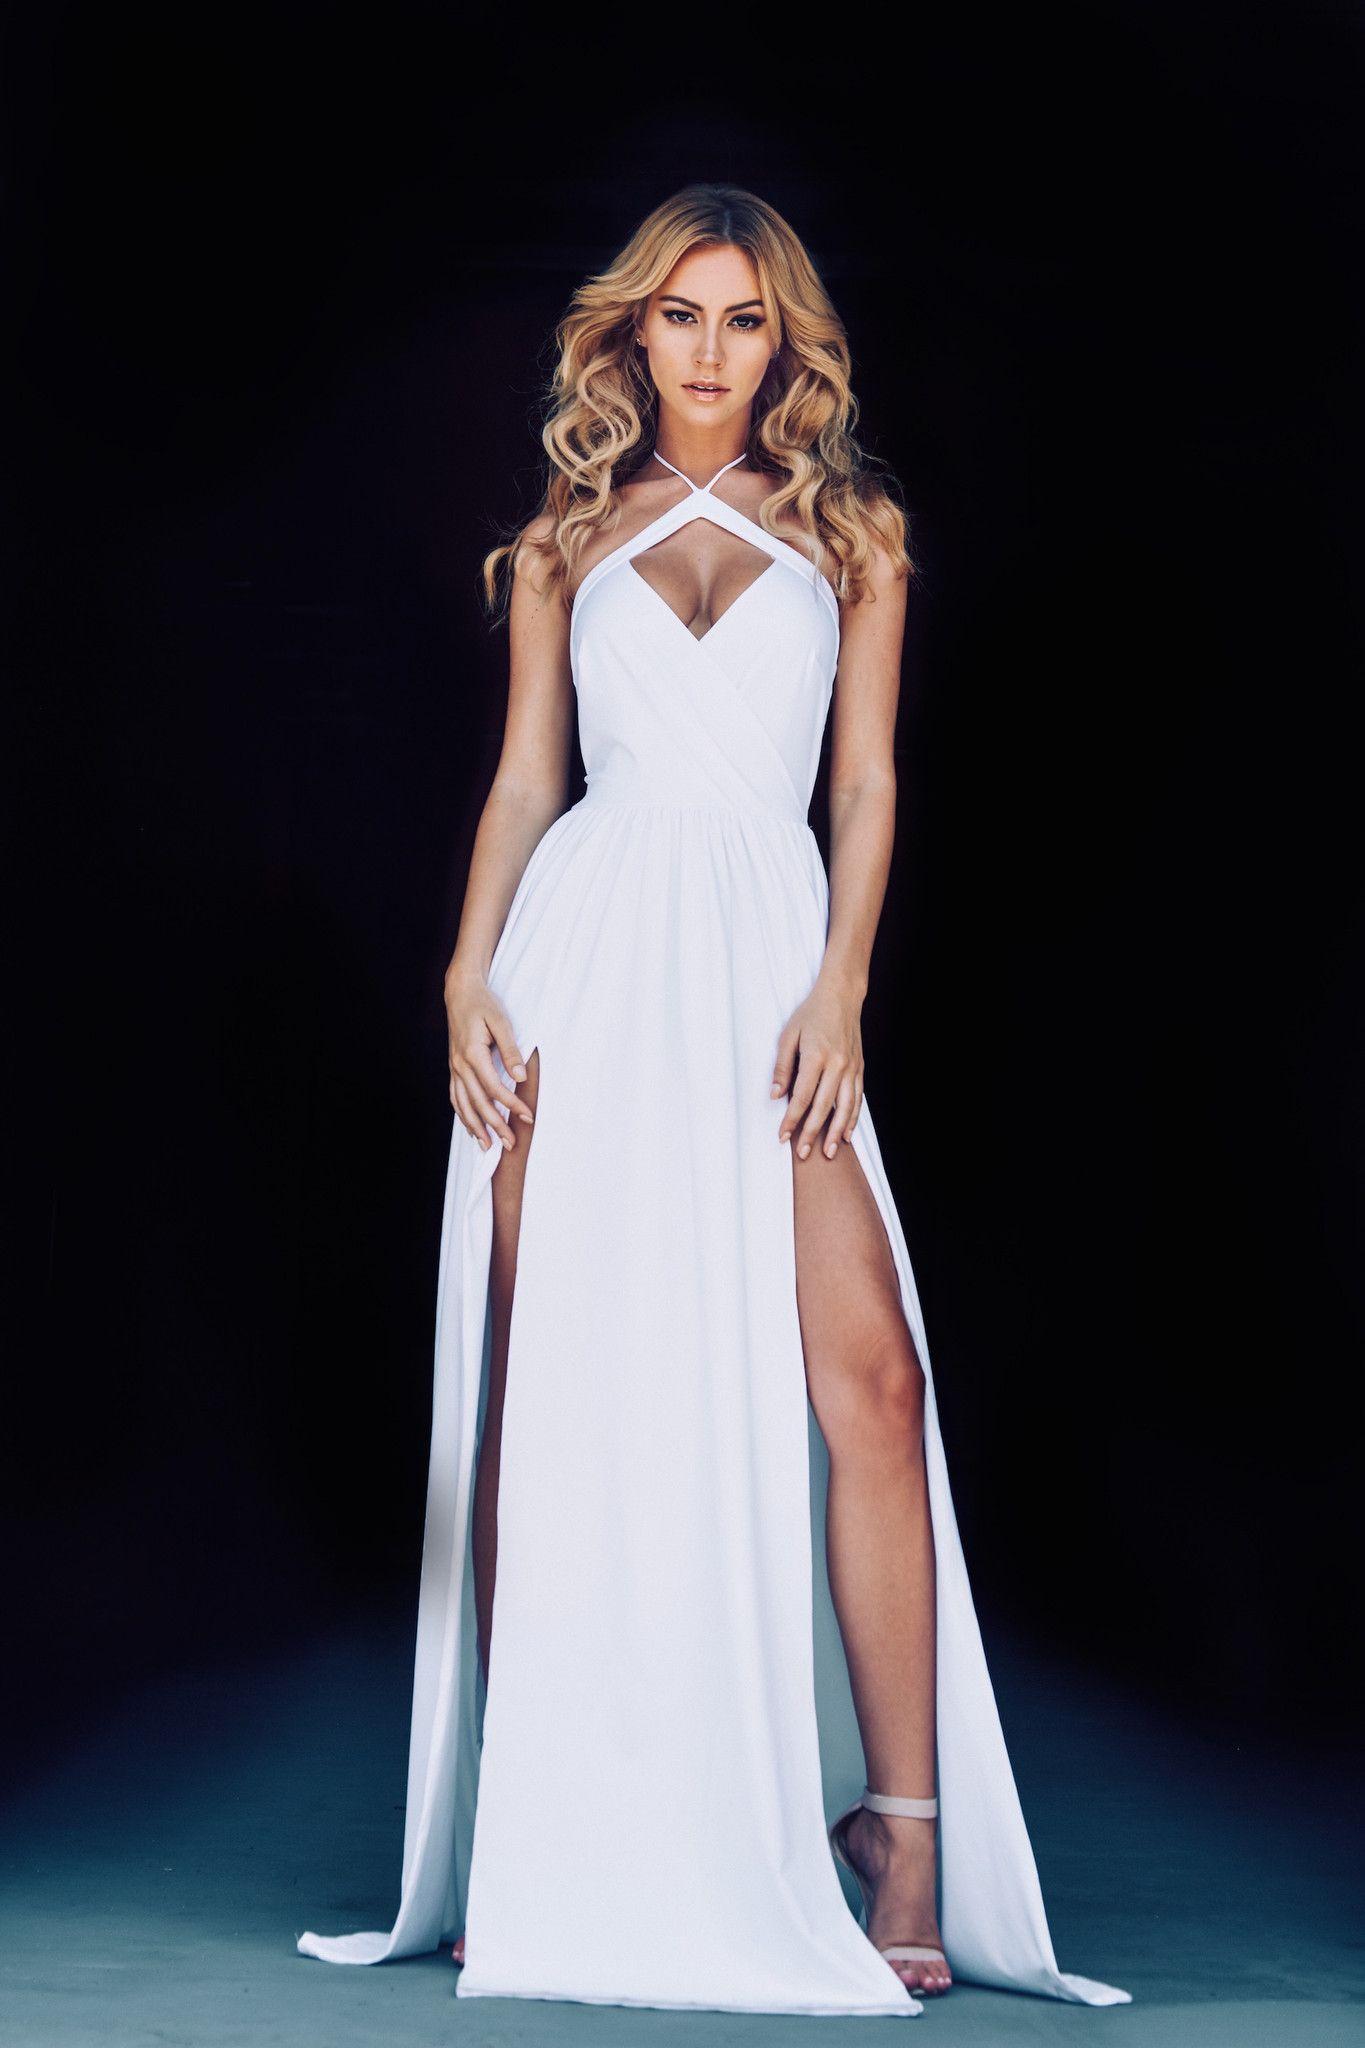 Halter neck wedding dress - Lurelly Bridal Wedding Dress | fabmood.com